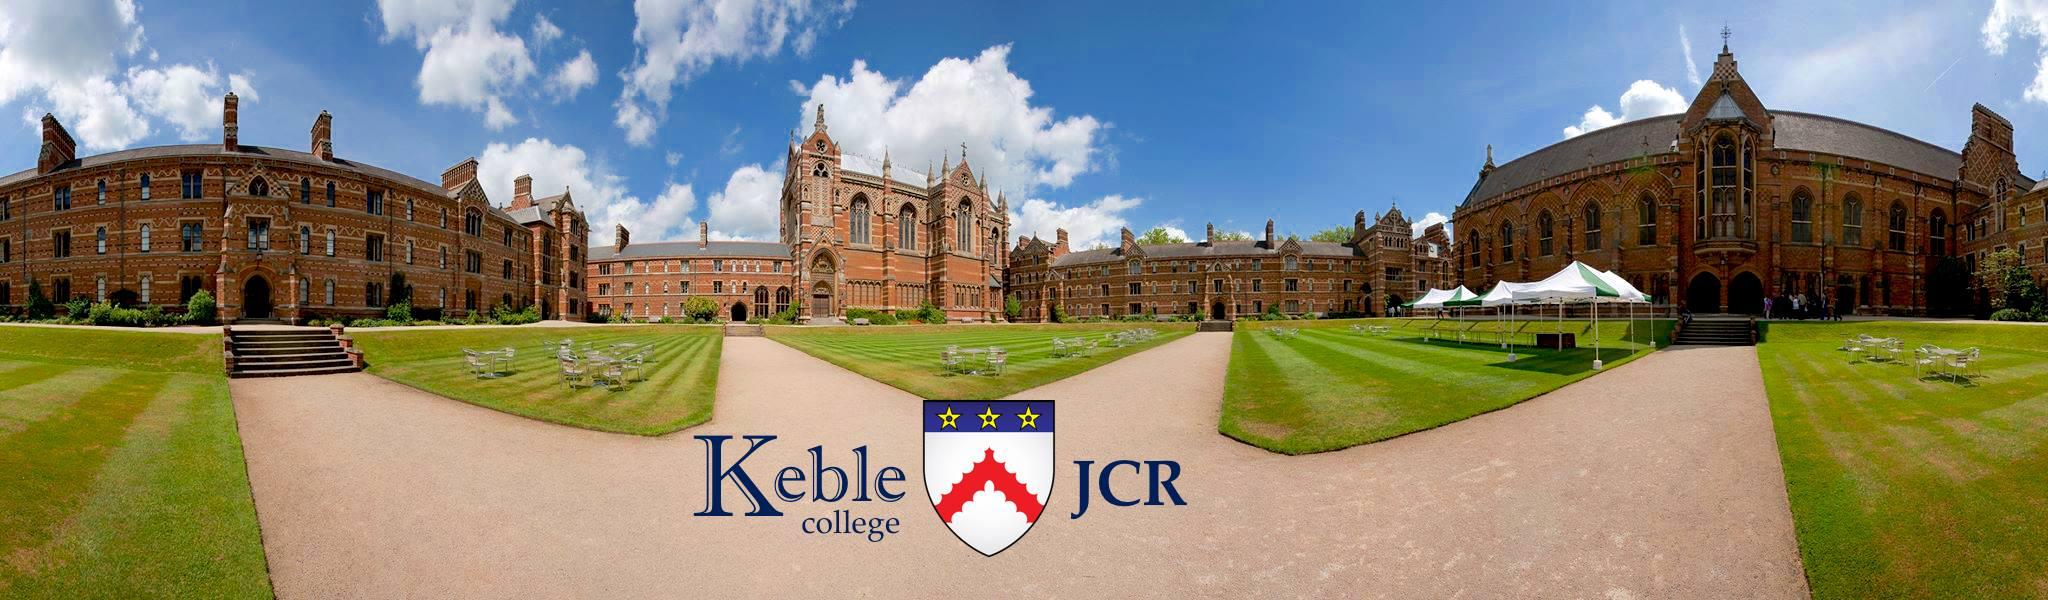 Keble College JCR